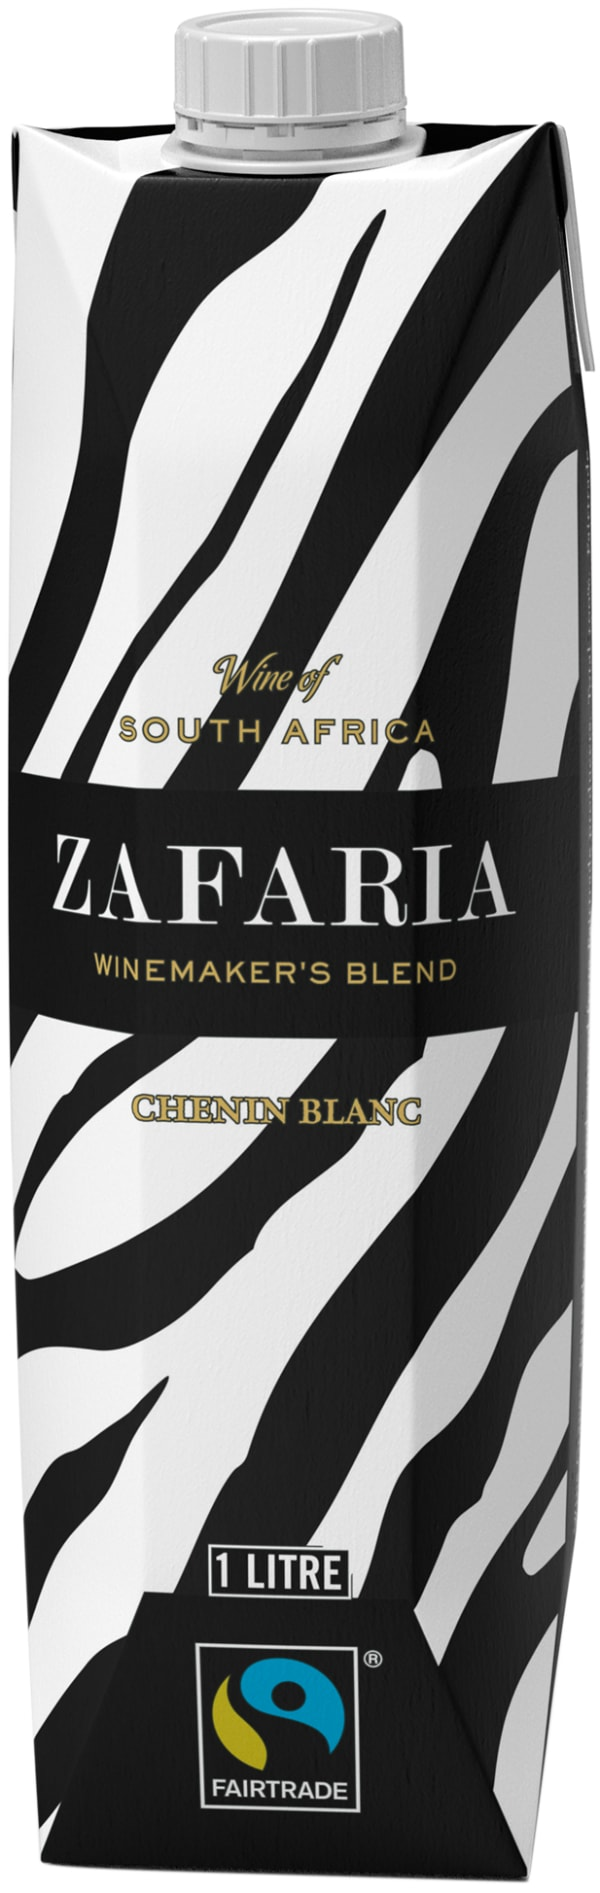 Zafaria Winemakers Blend Chenin Blanc 2019 kartongförpackning